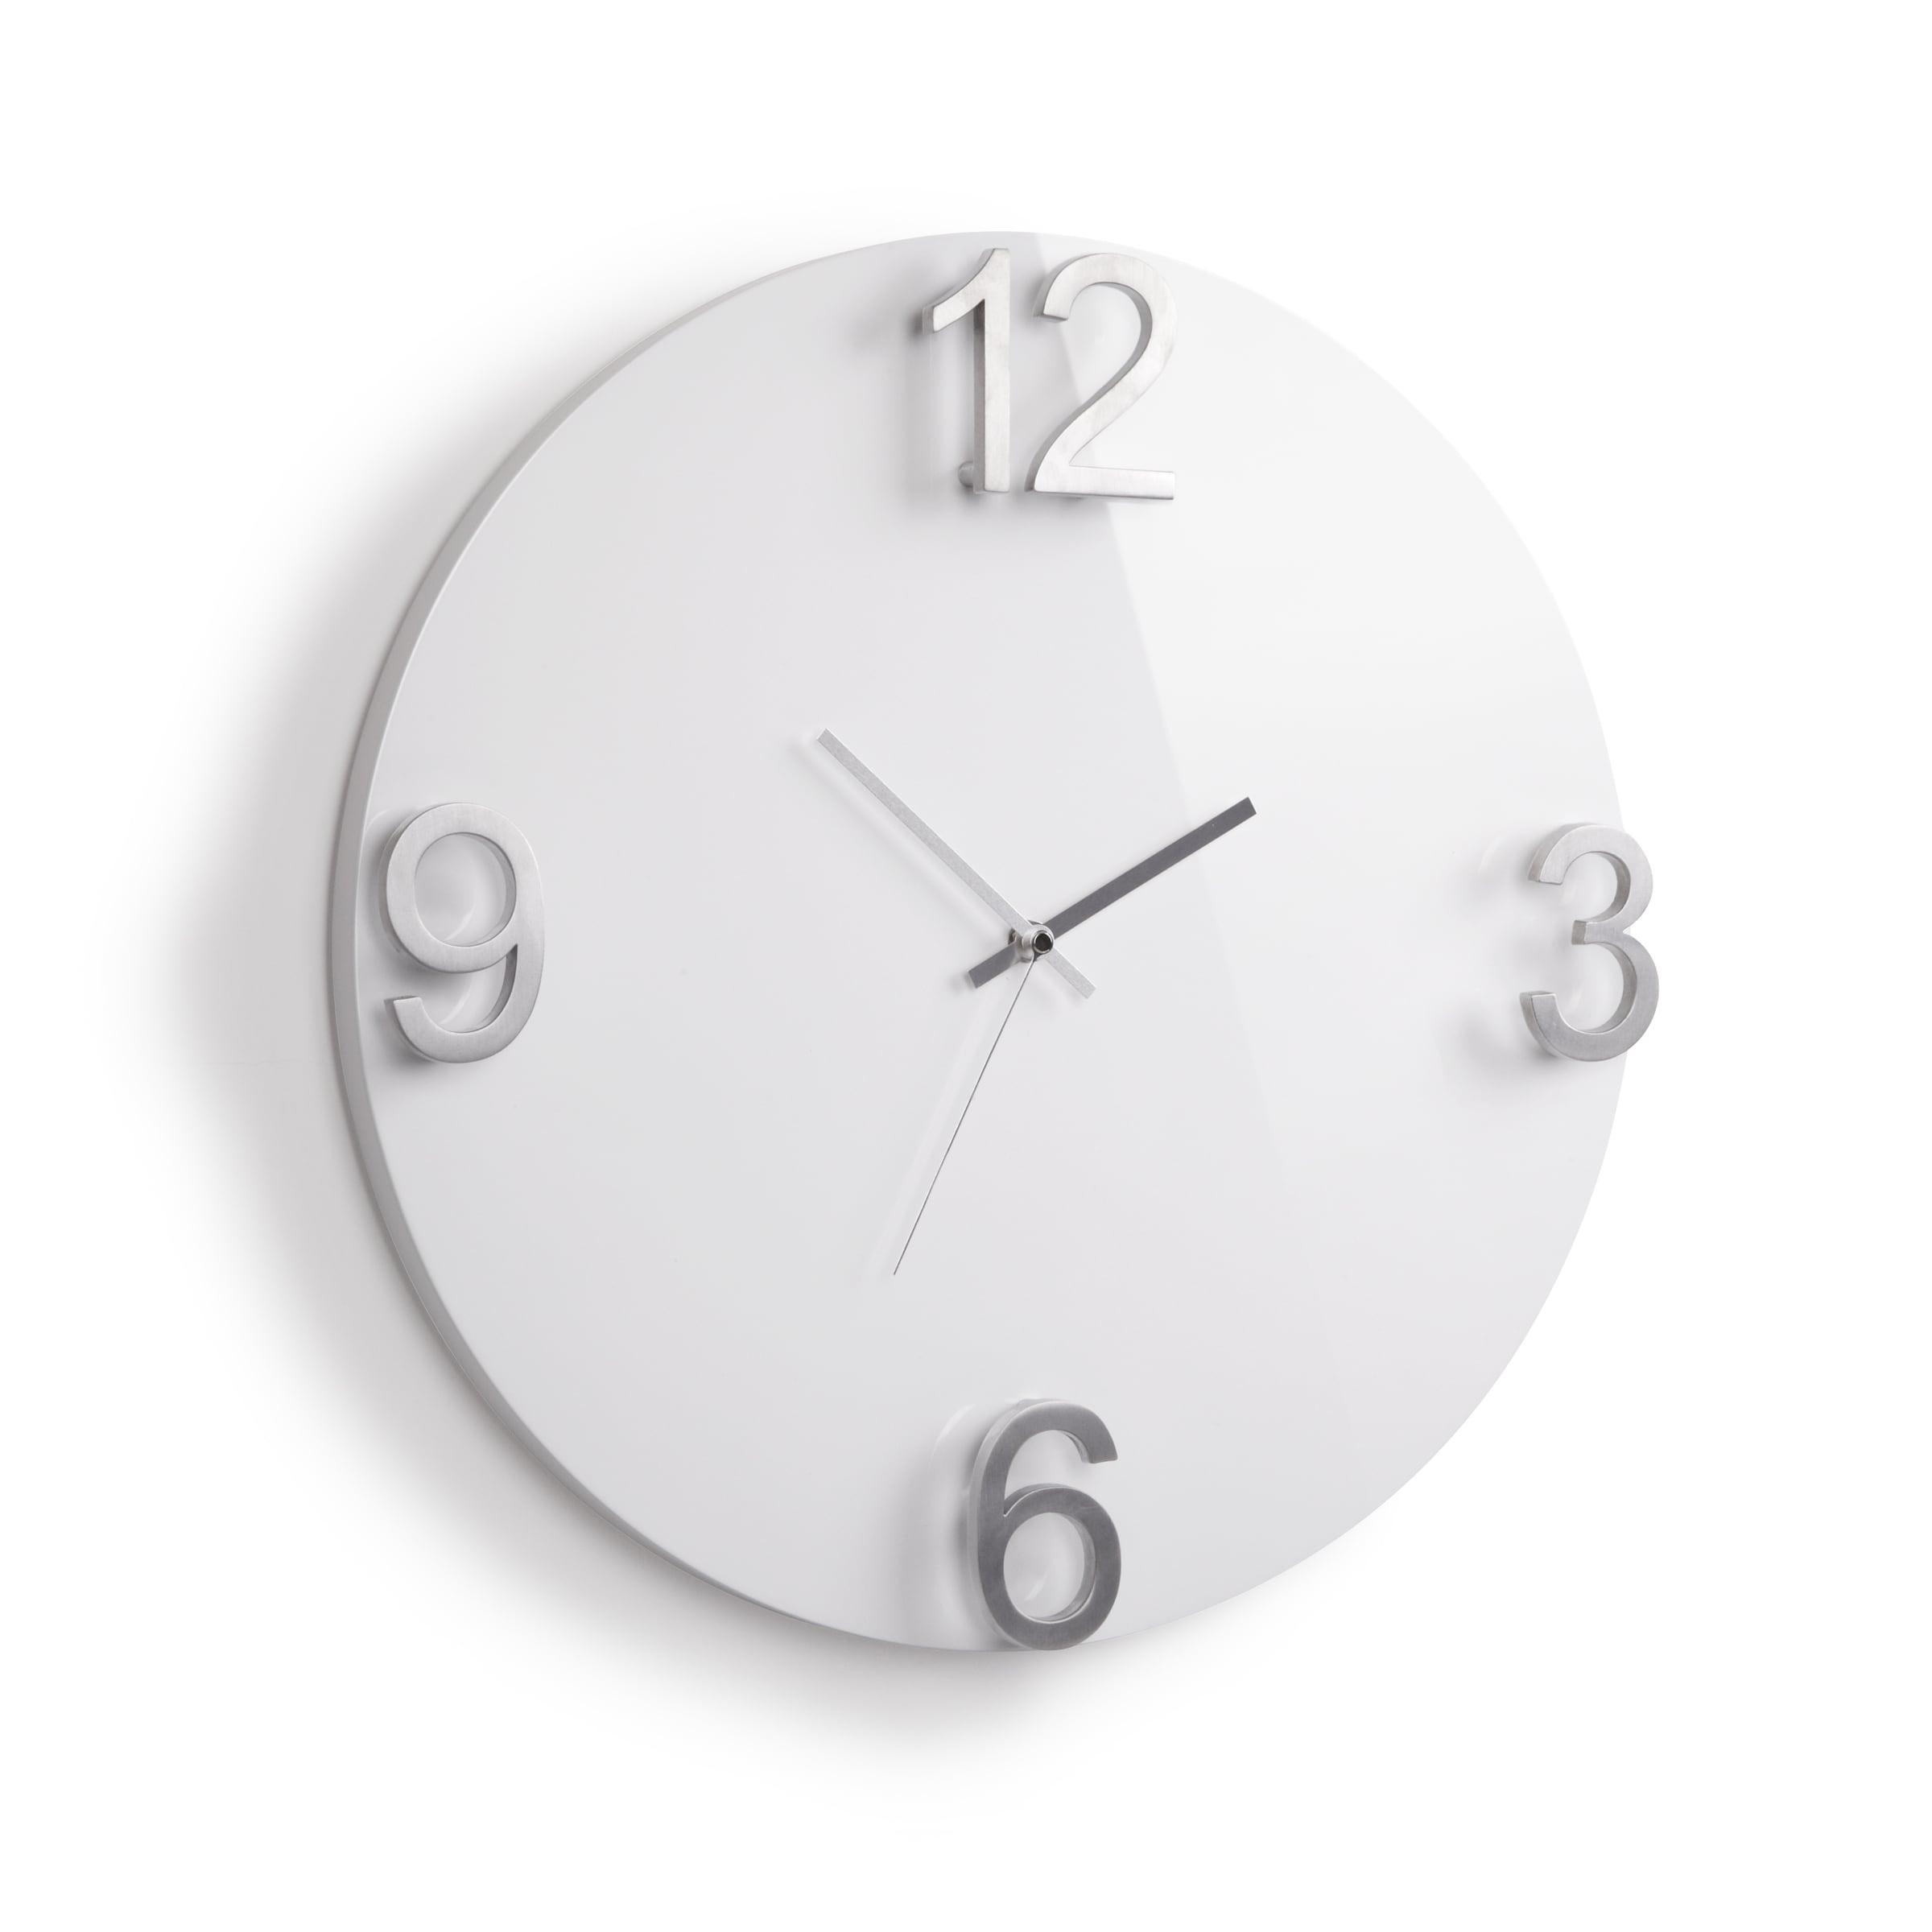 Horloge murale design gloss pour une cuisine tendance